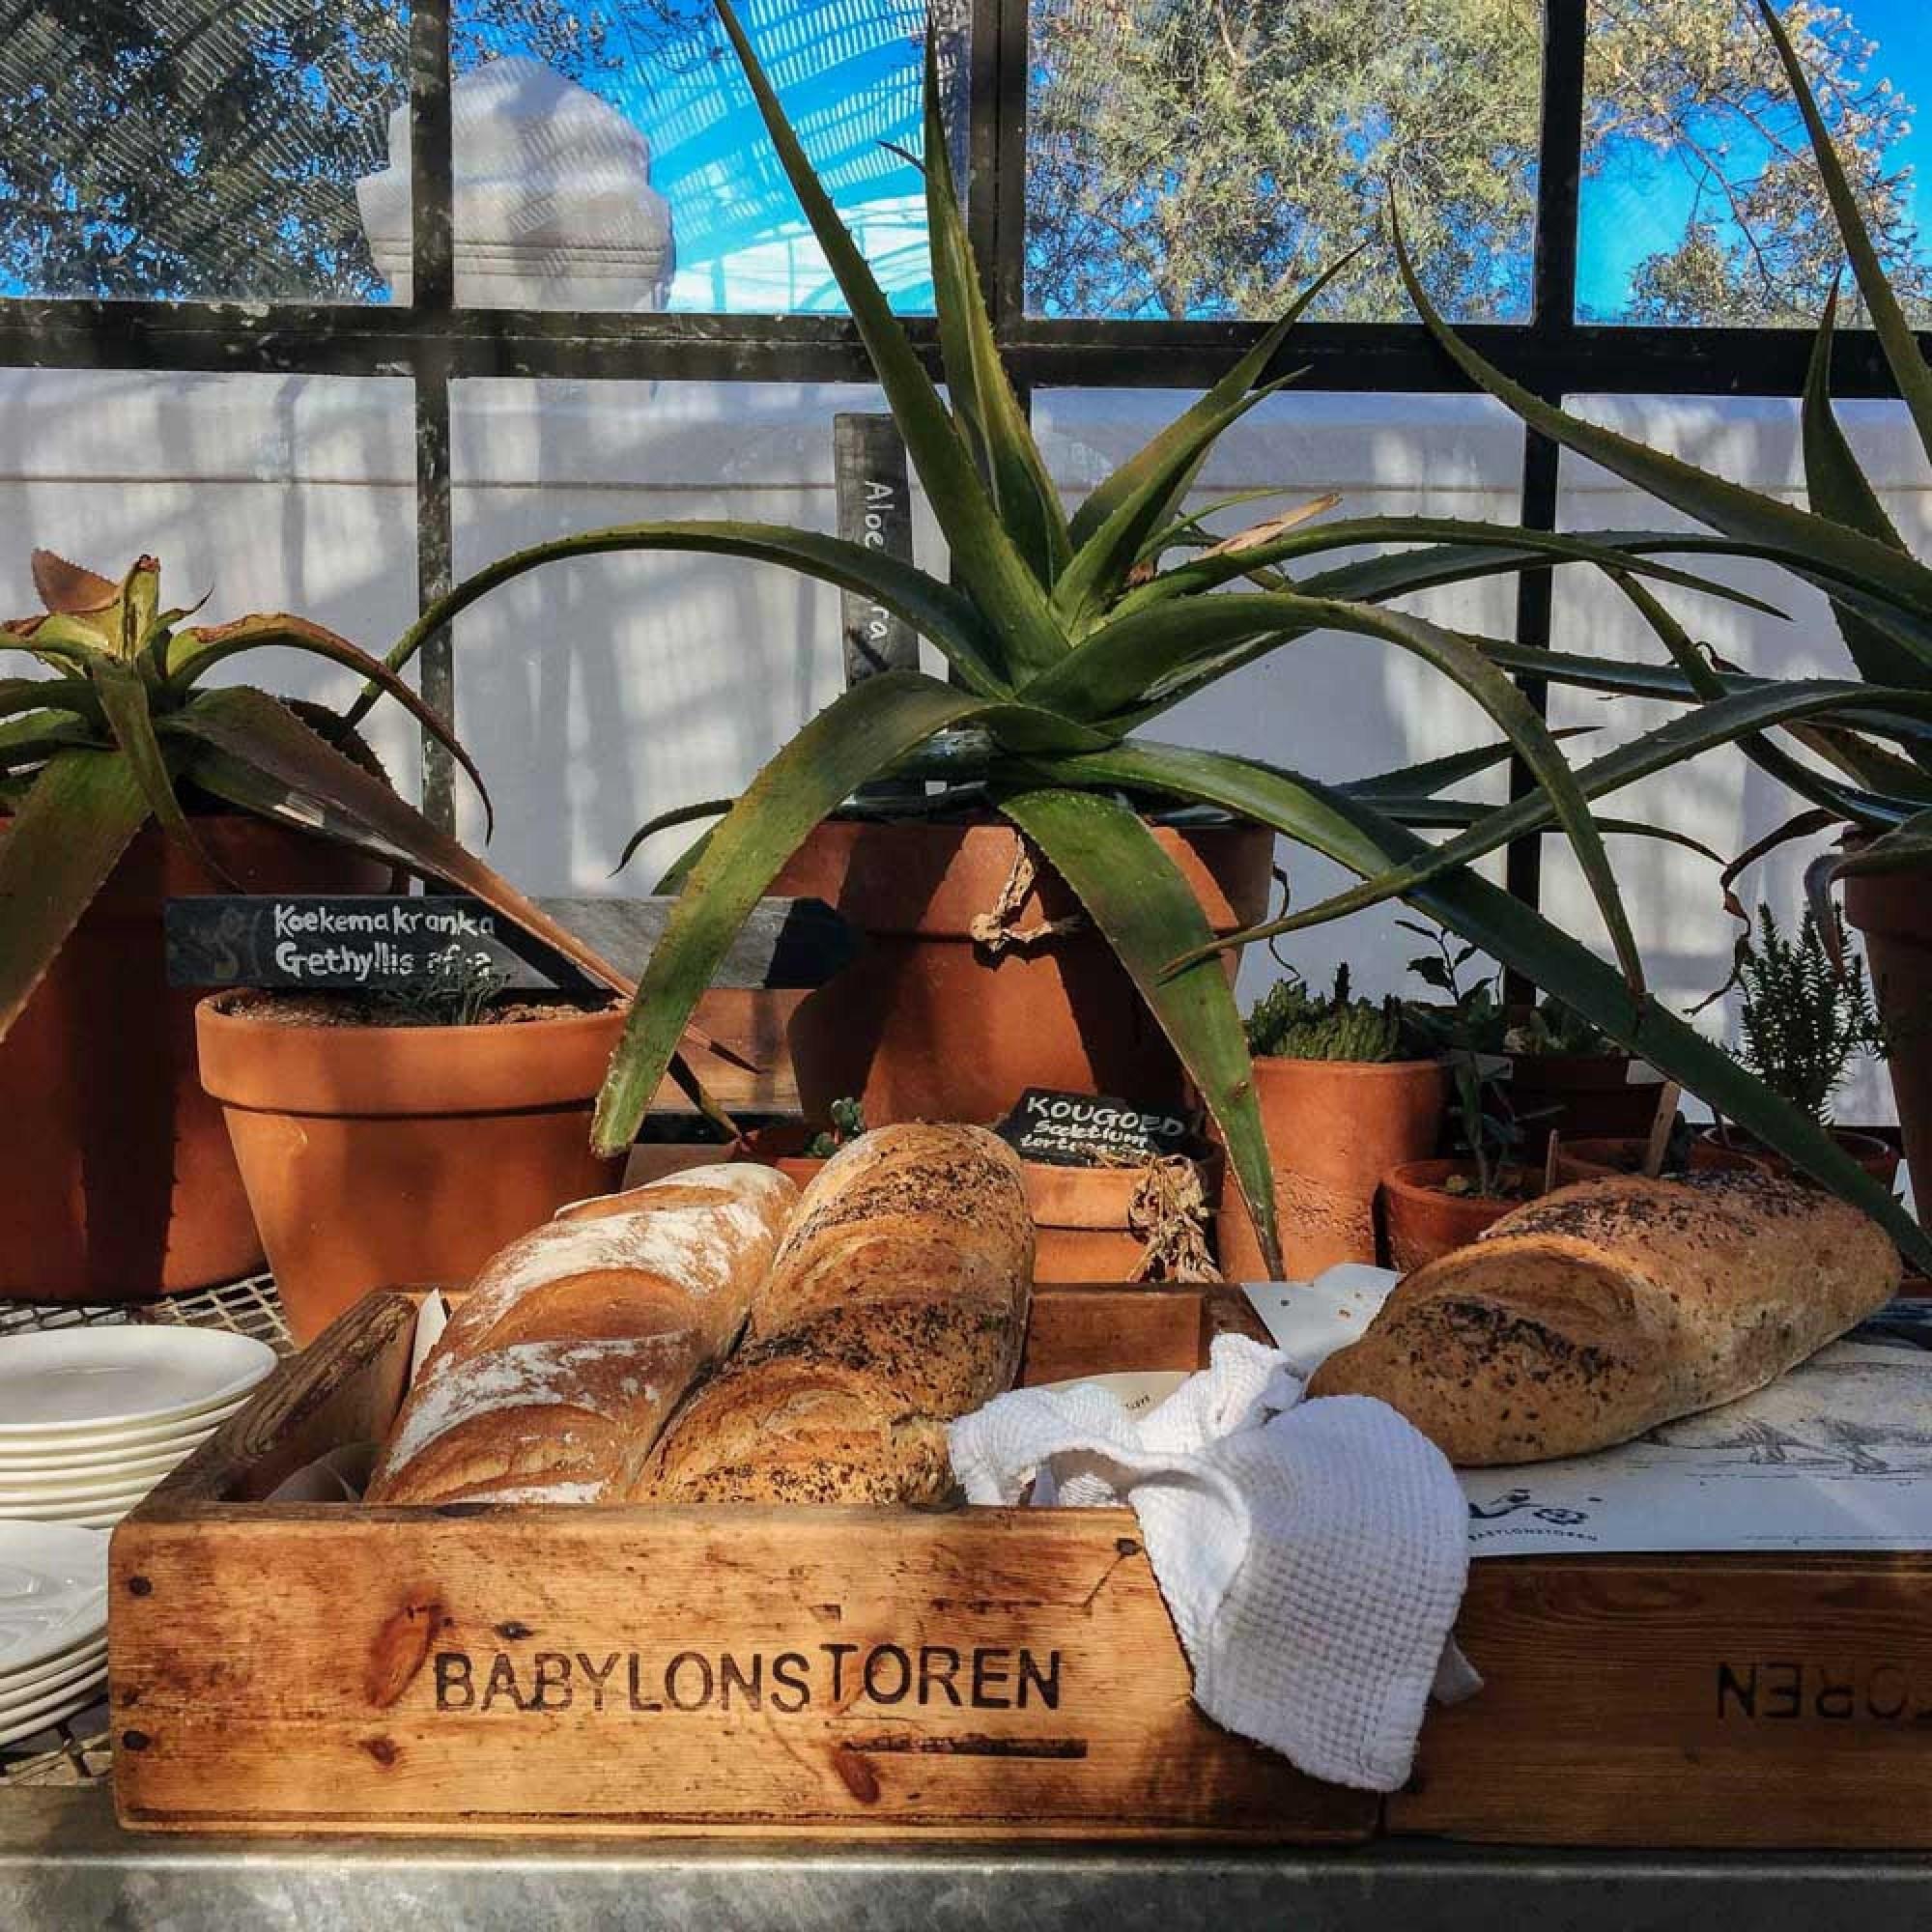 Breakfast at Babylonstoren